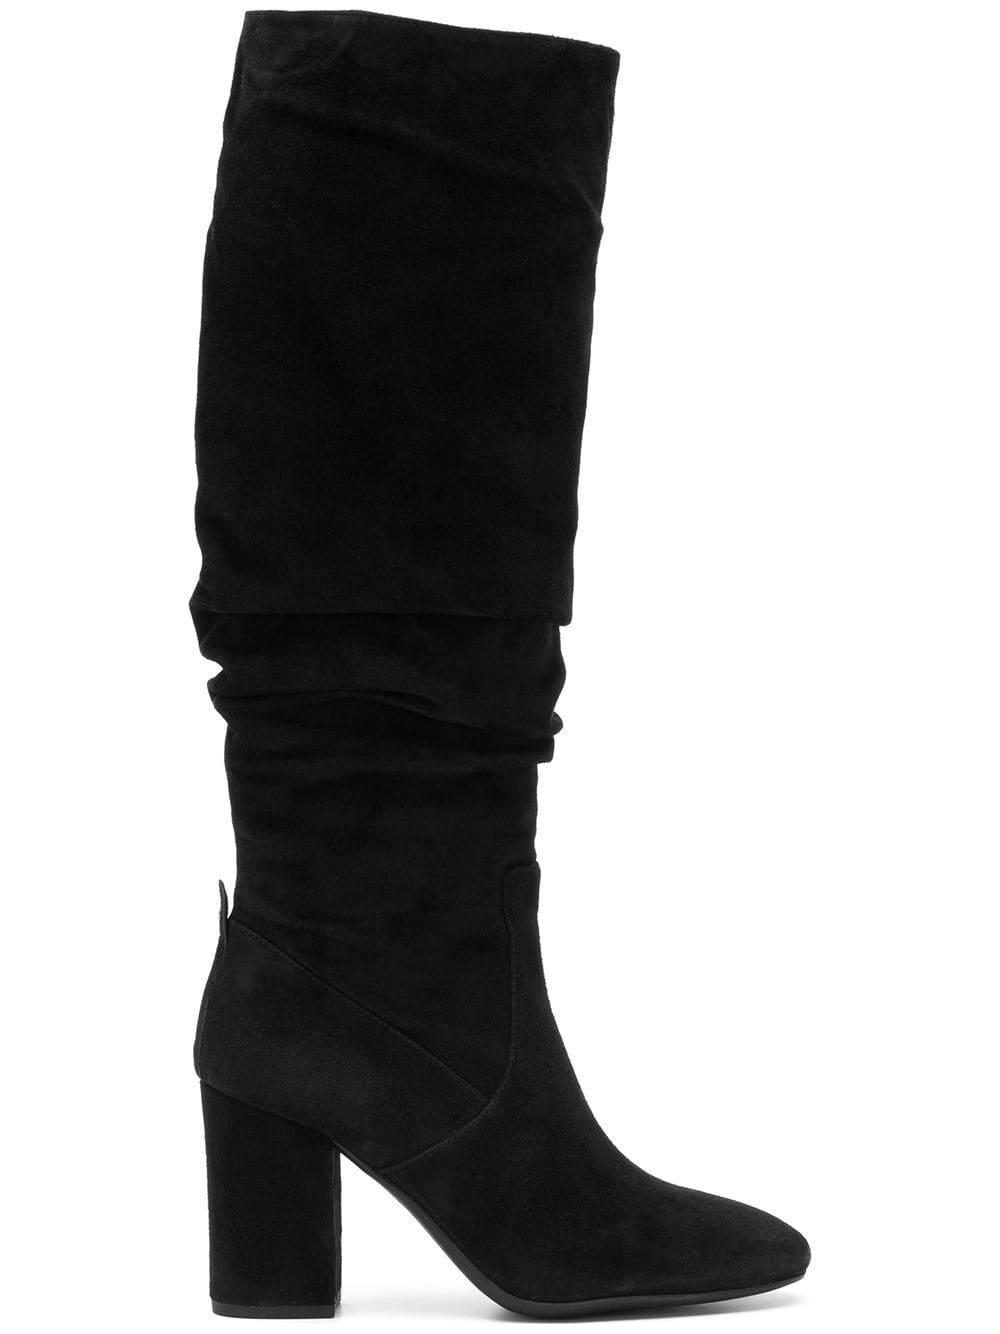 3787e456ca0 Coach Graham Knee-High Boots - Black